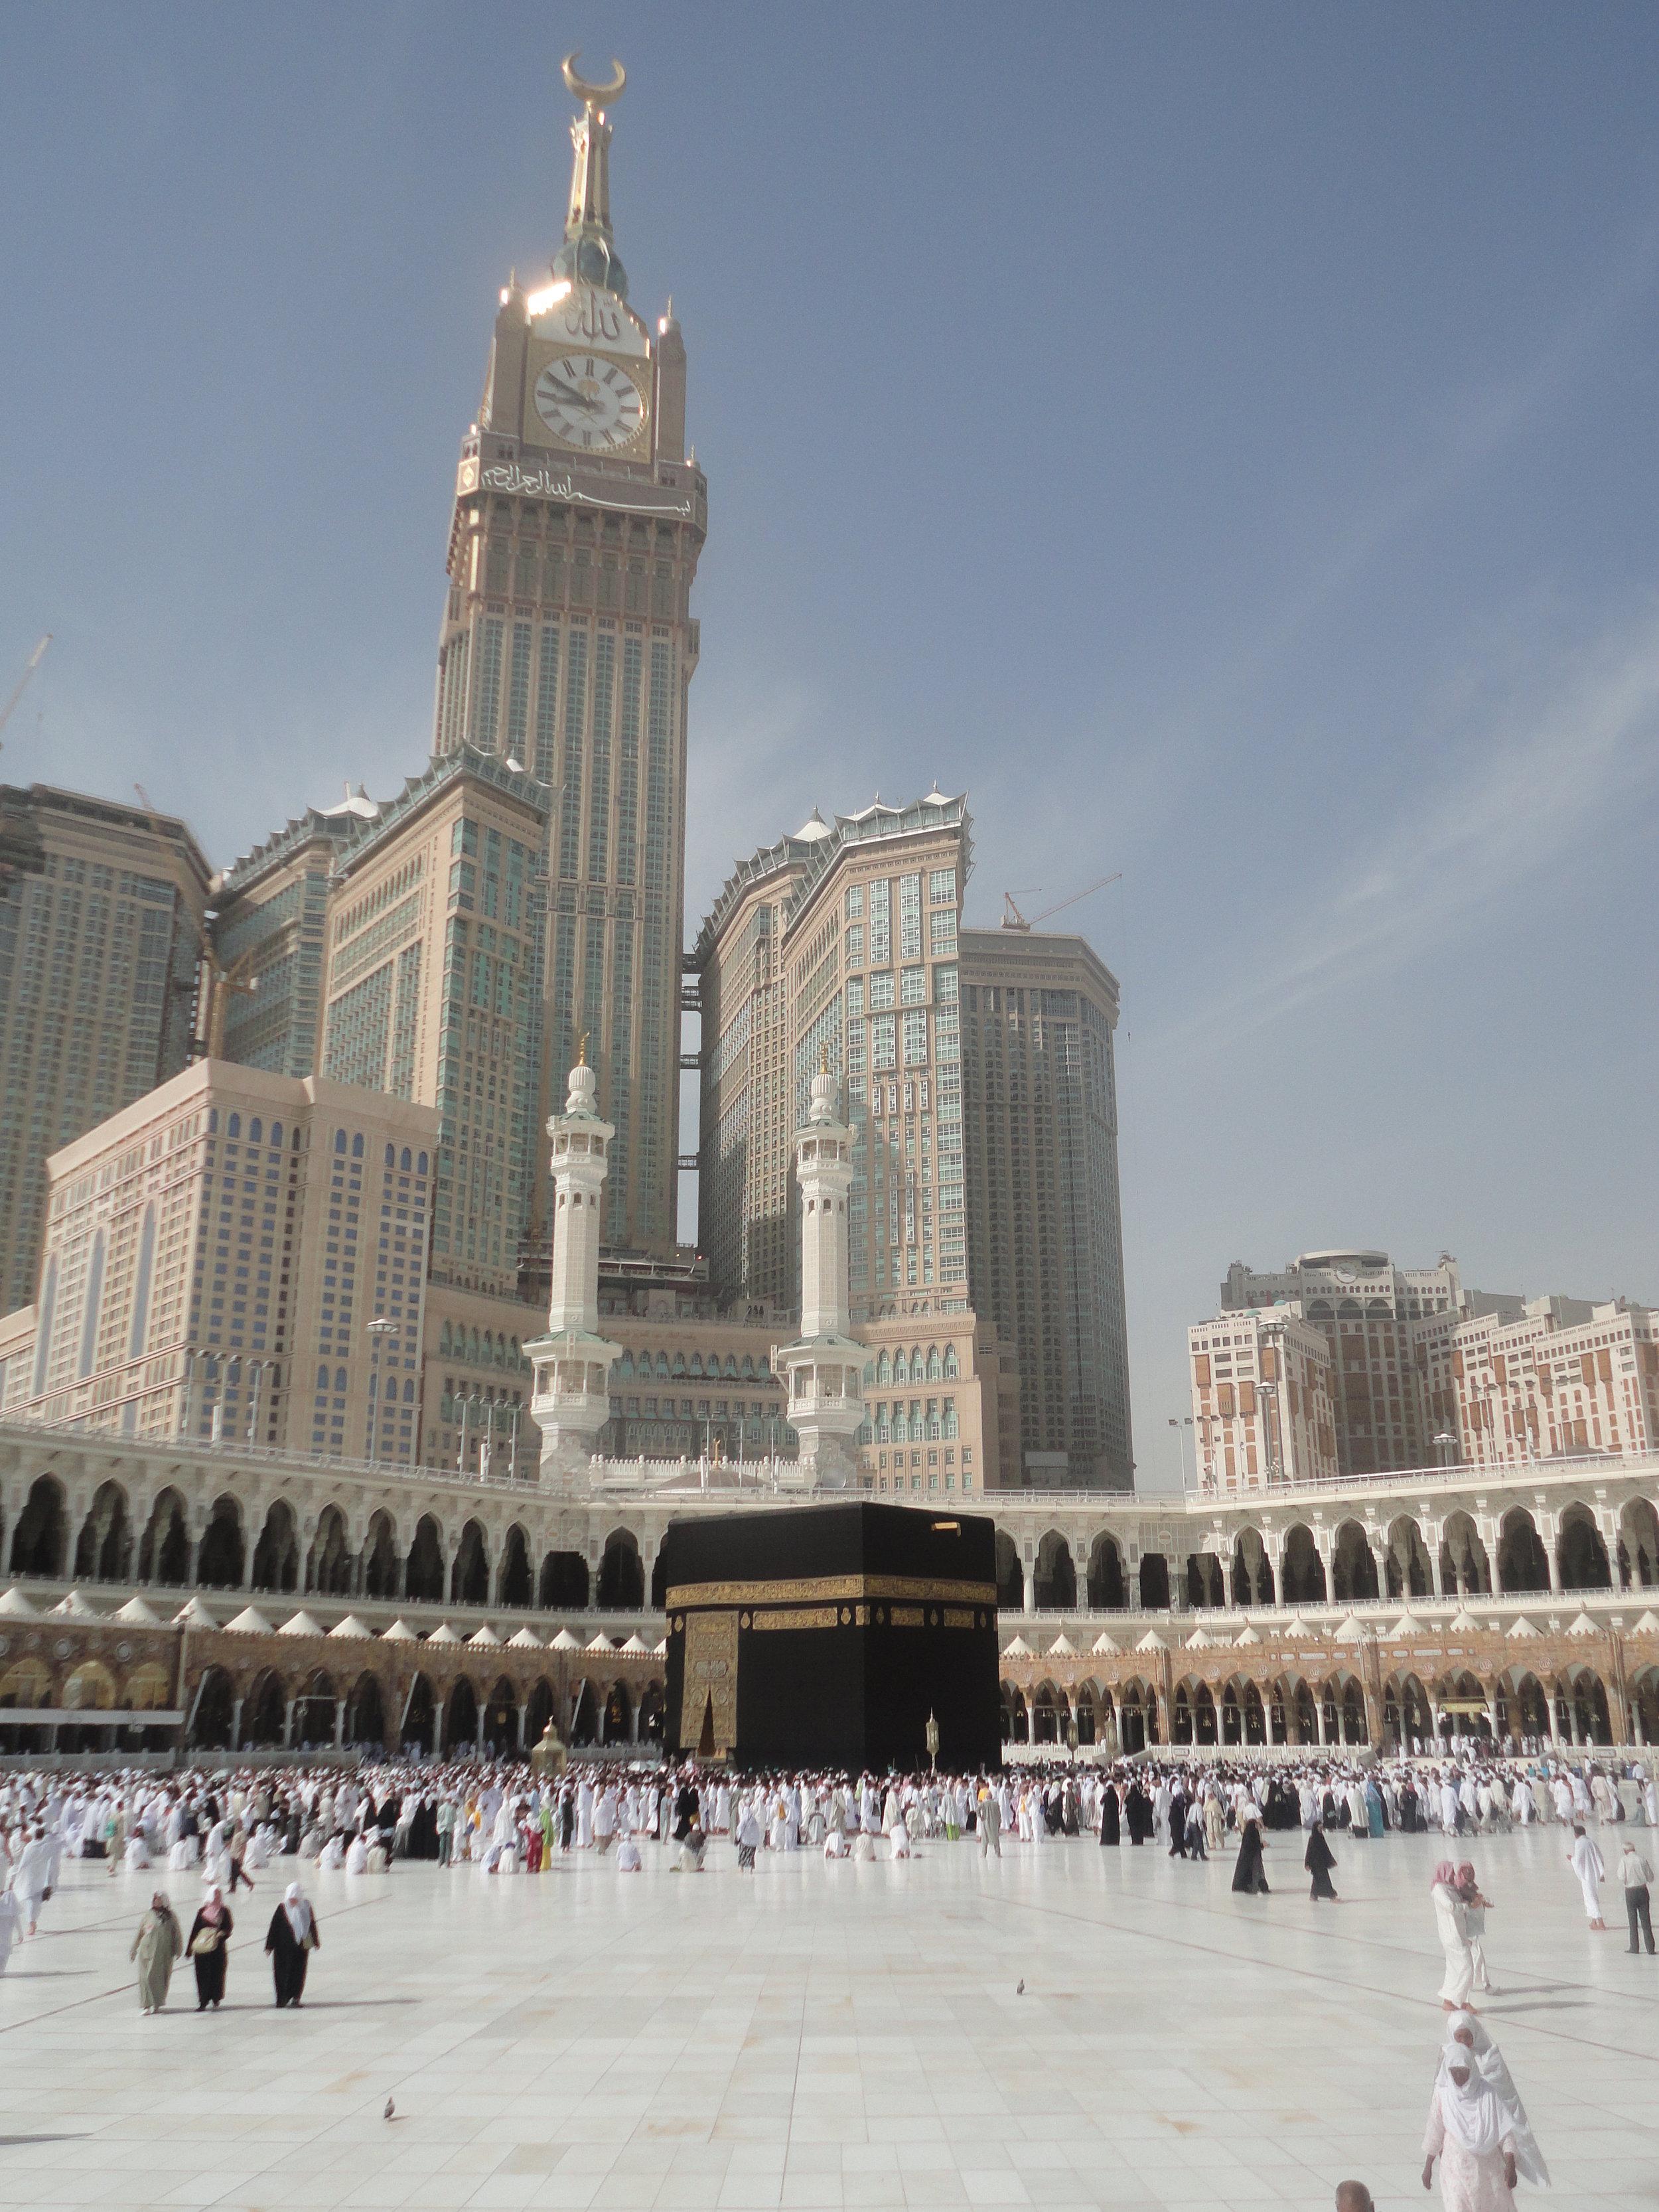 Figure 2. The Ka'ba with Abraj al Bait Towers in the background, May 5, 2012. Copyright Kishwar Rizvi.